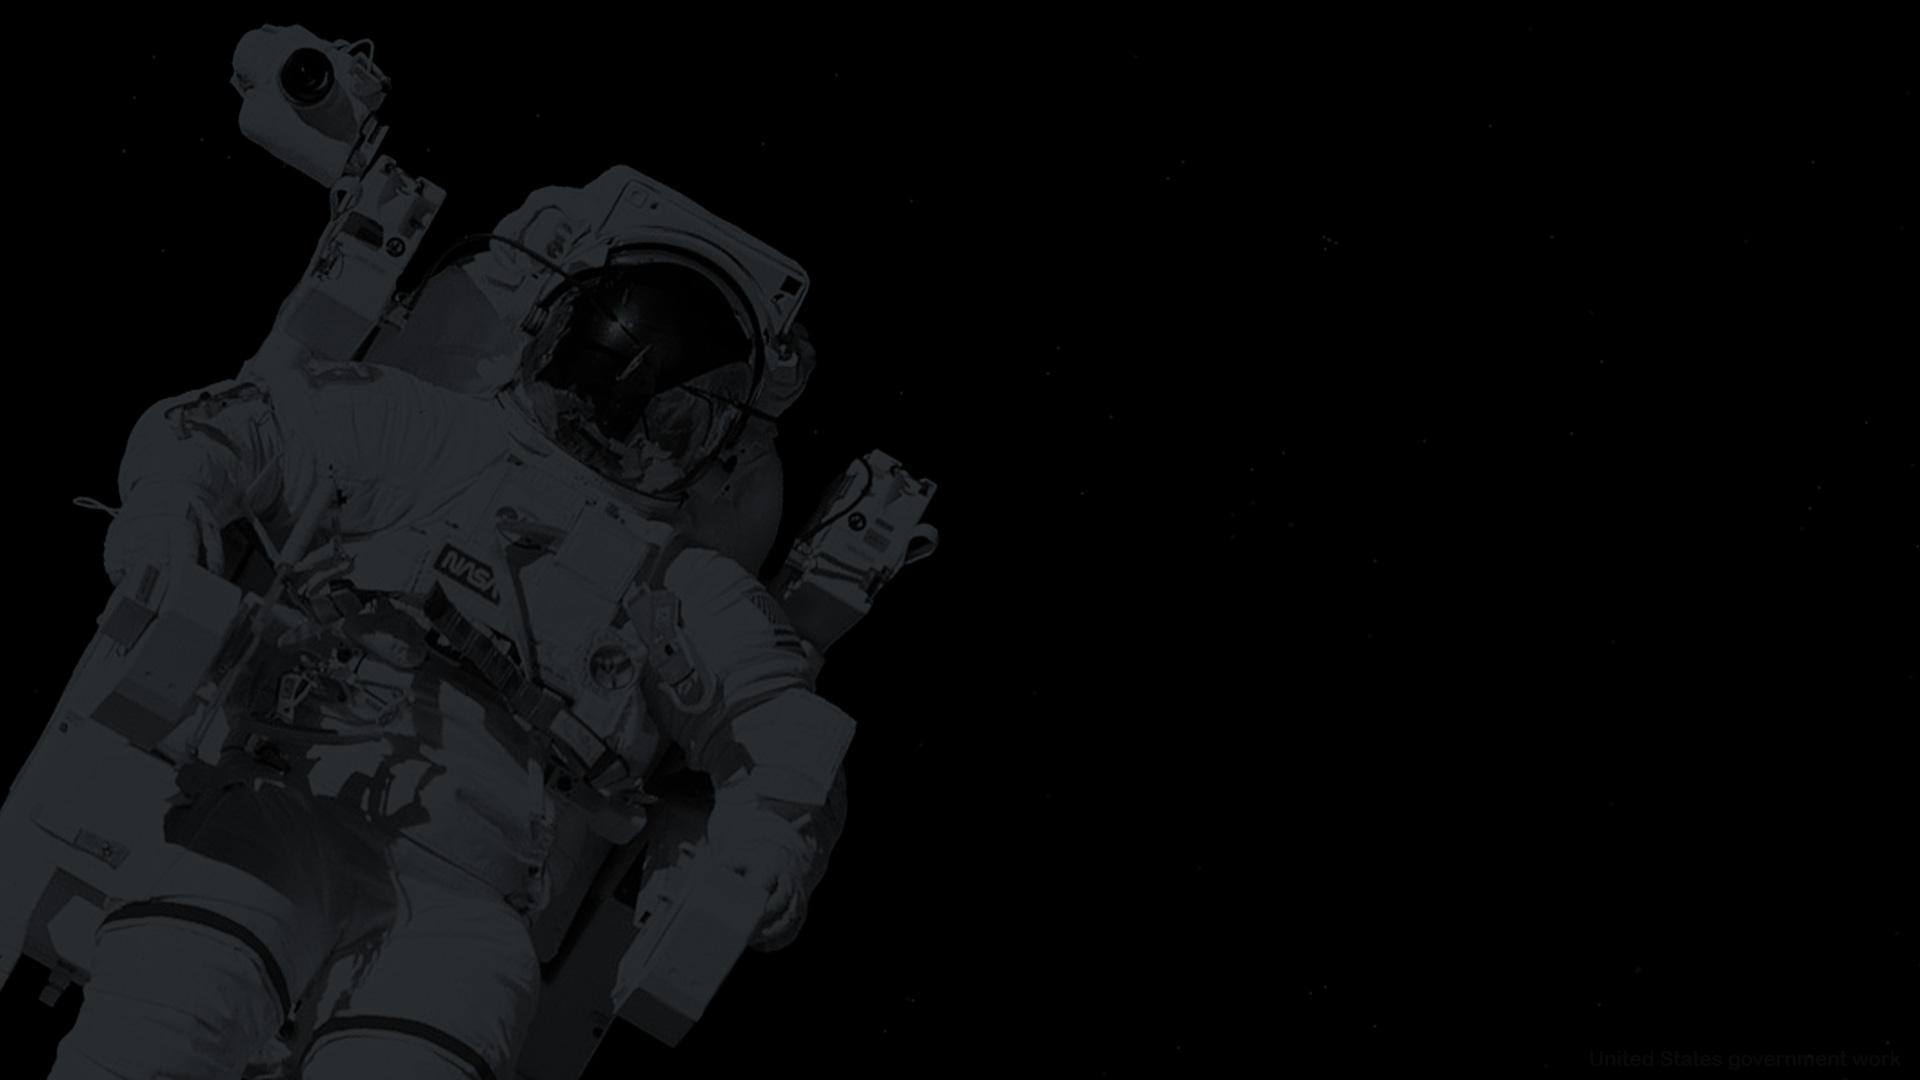 Astronaut Dark Background for presentations